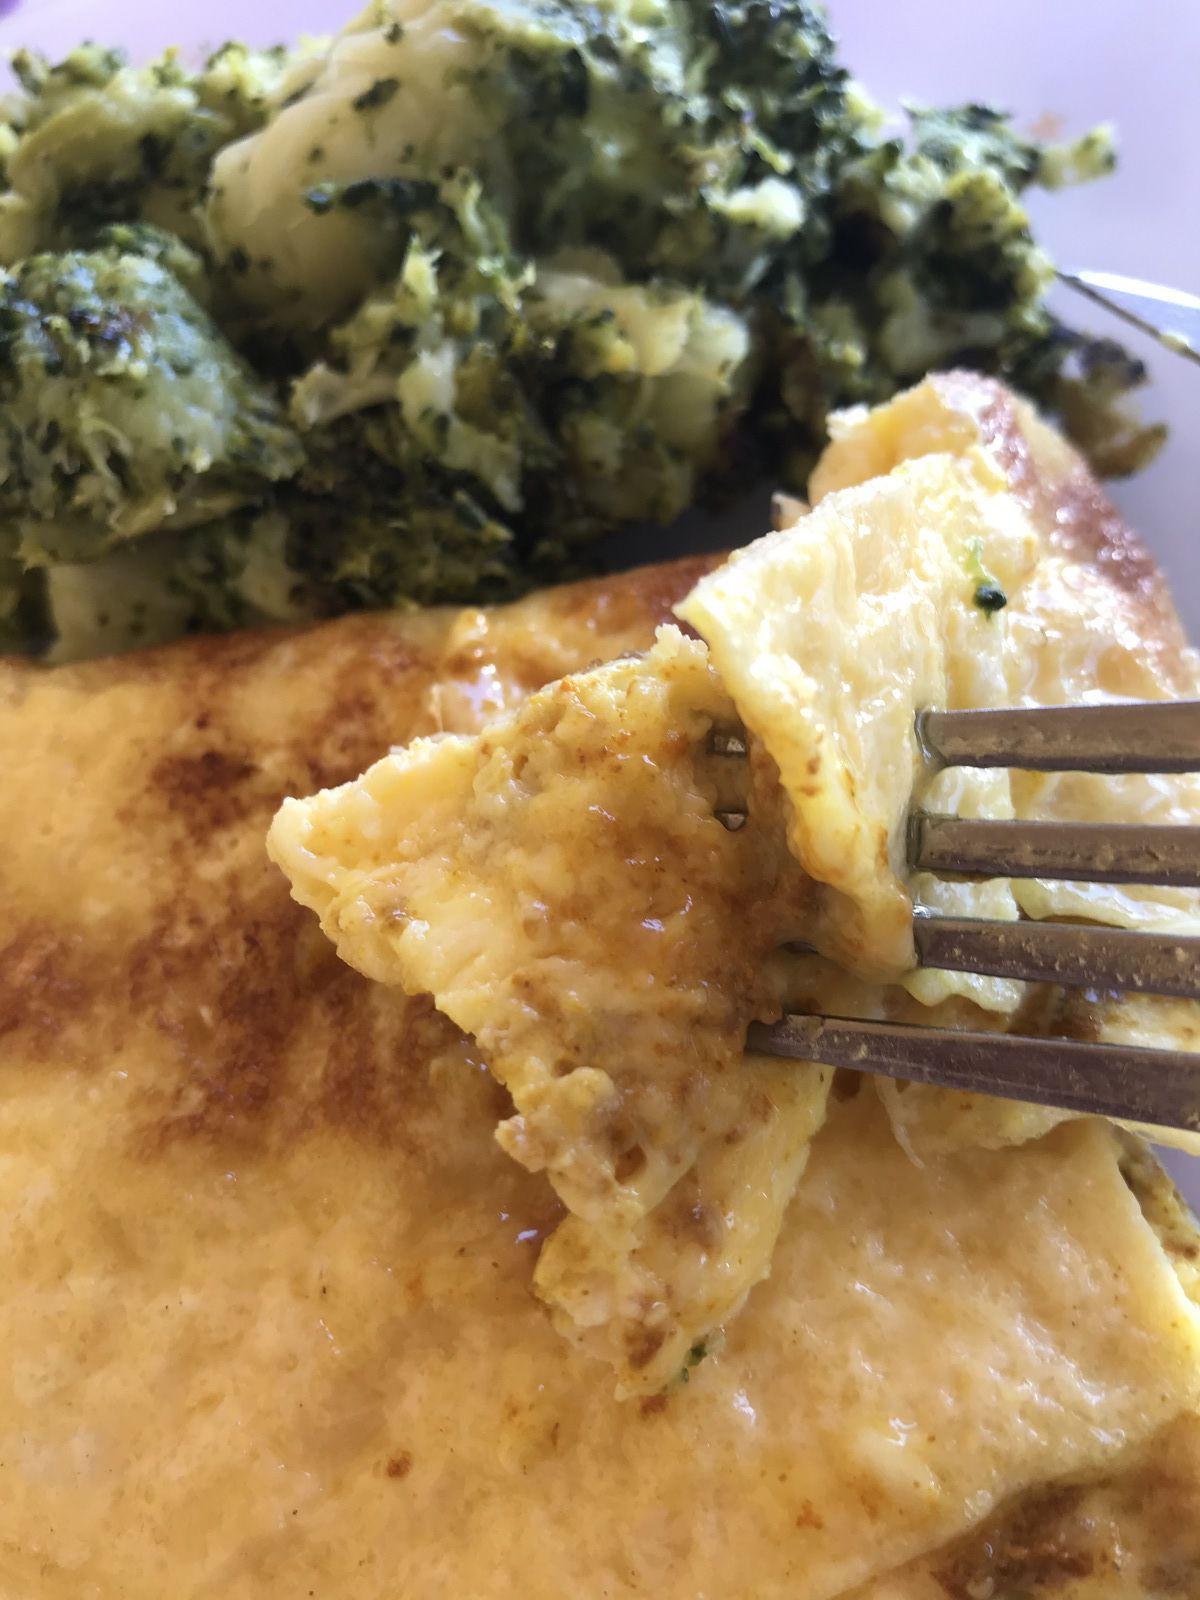 Omelette au chèvre, curcuma et emmental